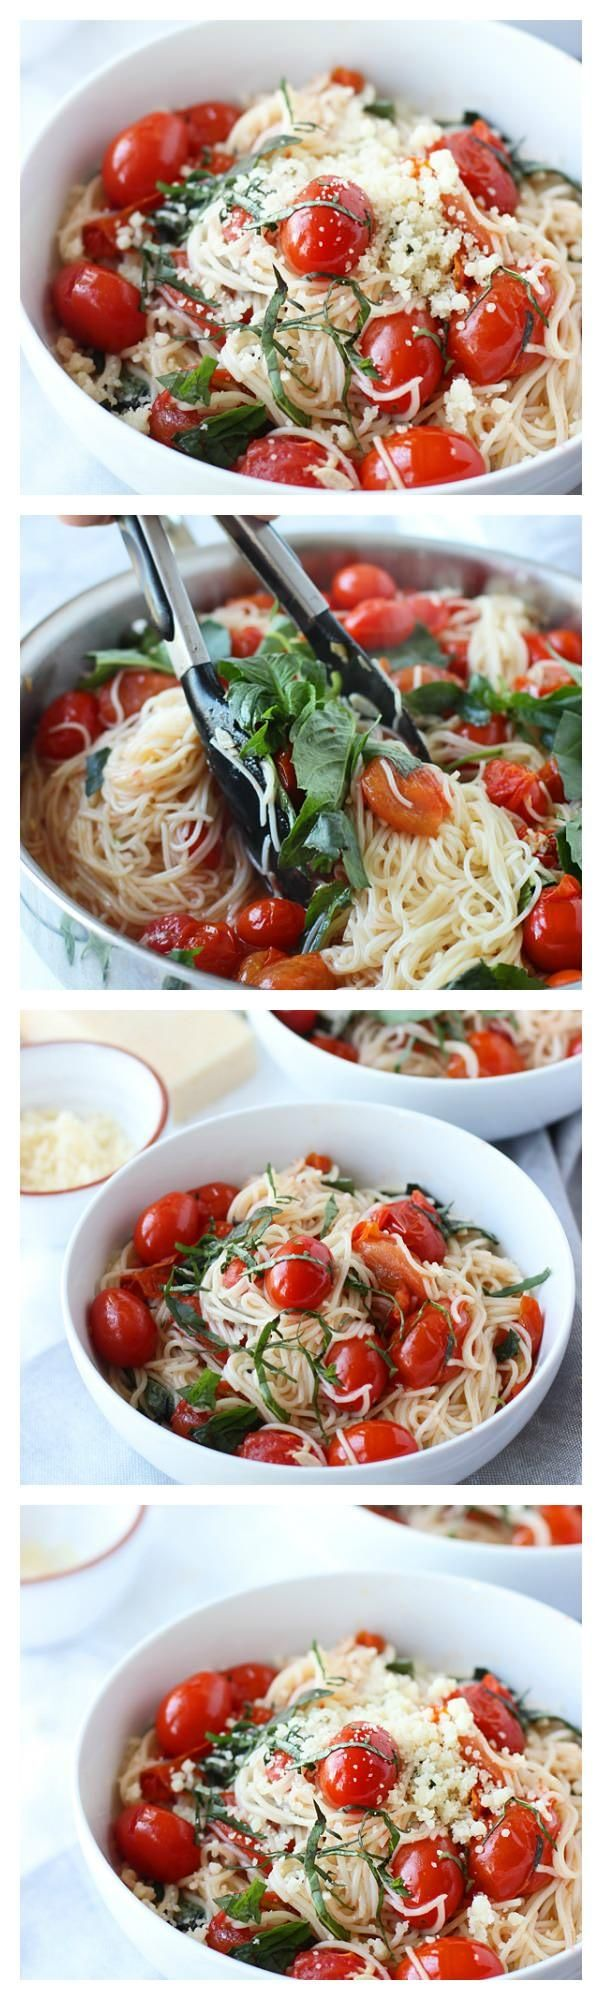 Just 20 minutes to make a fresh basil tomato pasta.